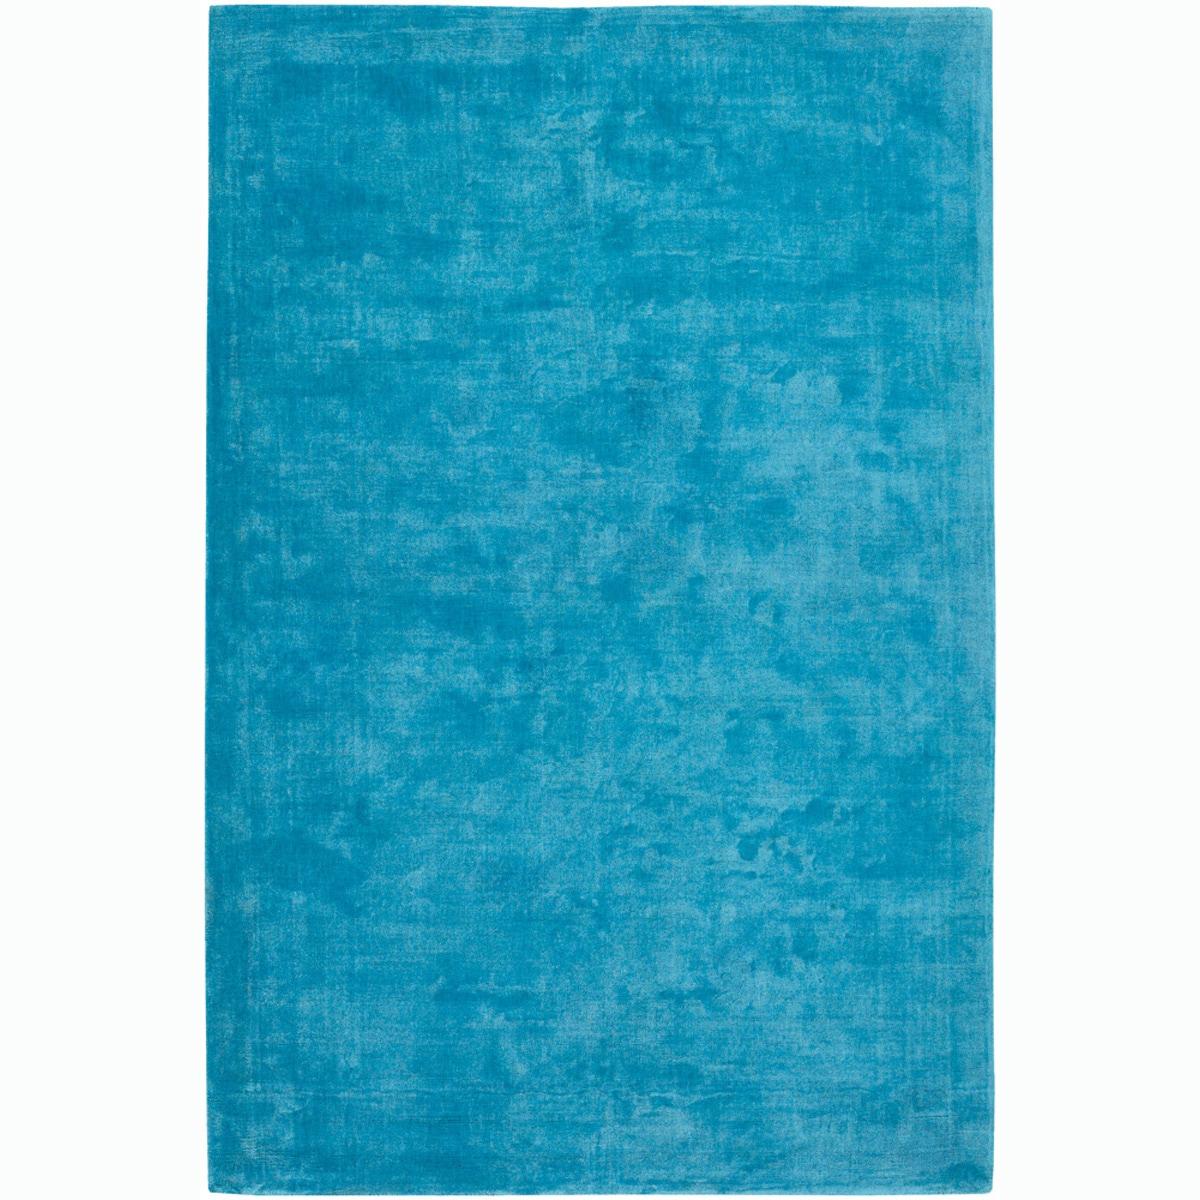 "Large Handwoven Mandara Blue Rug (5' x 7'6"")"